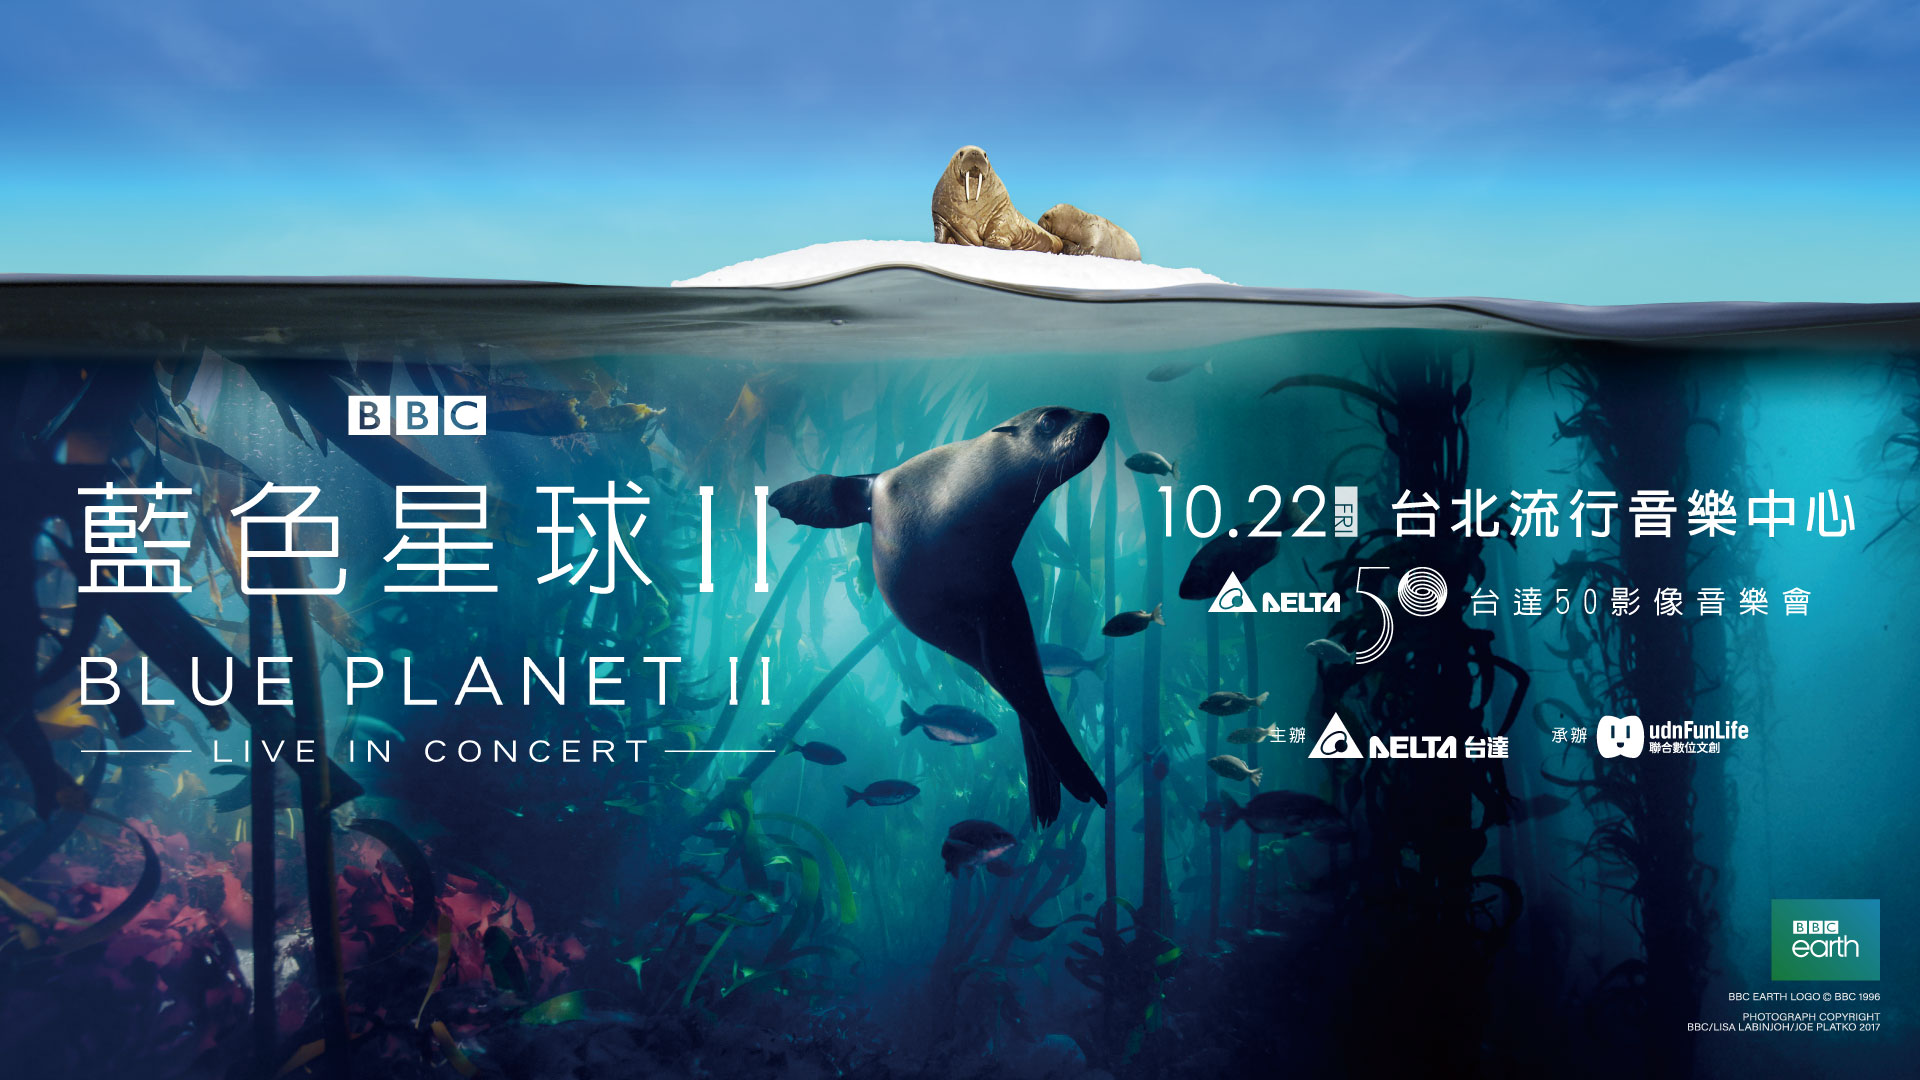 《BBC藍色星球II》台達50影像音樂會